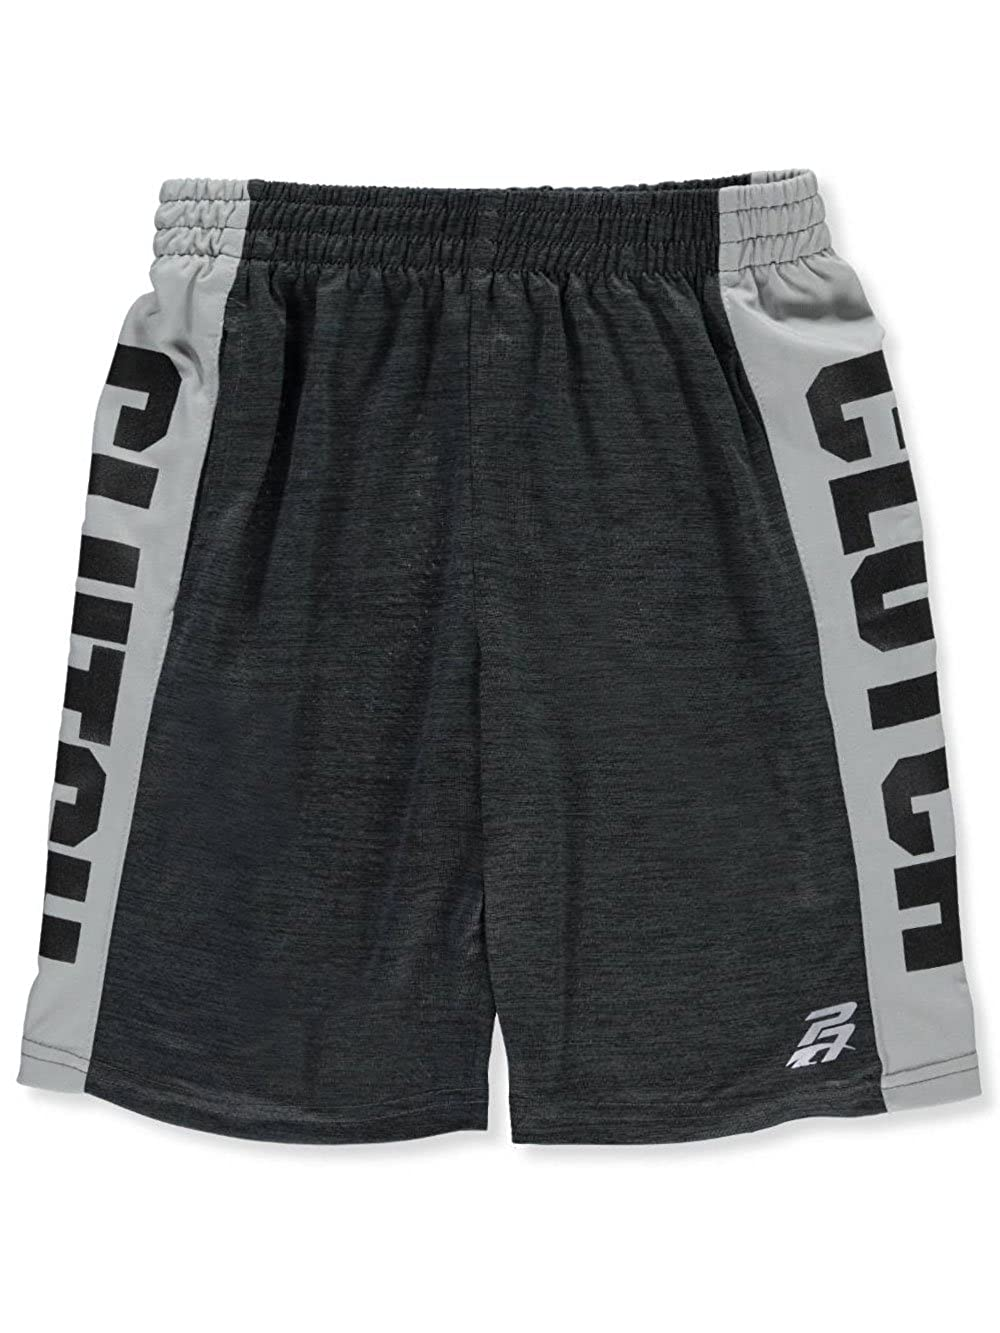 Pro Athlete Boys Shorts